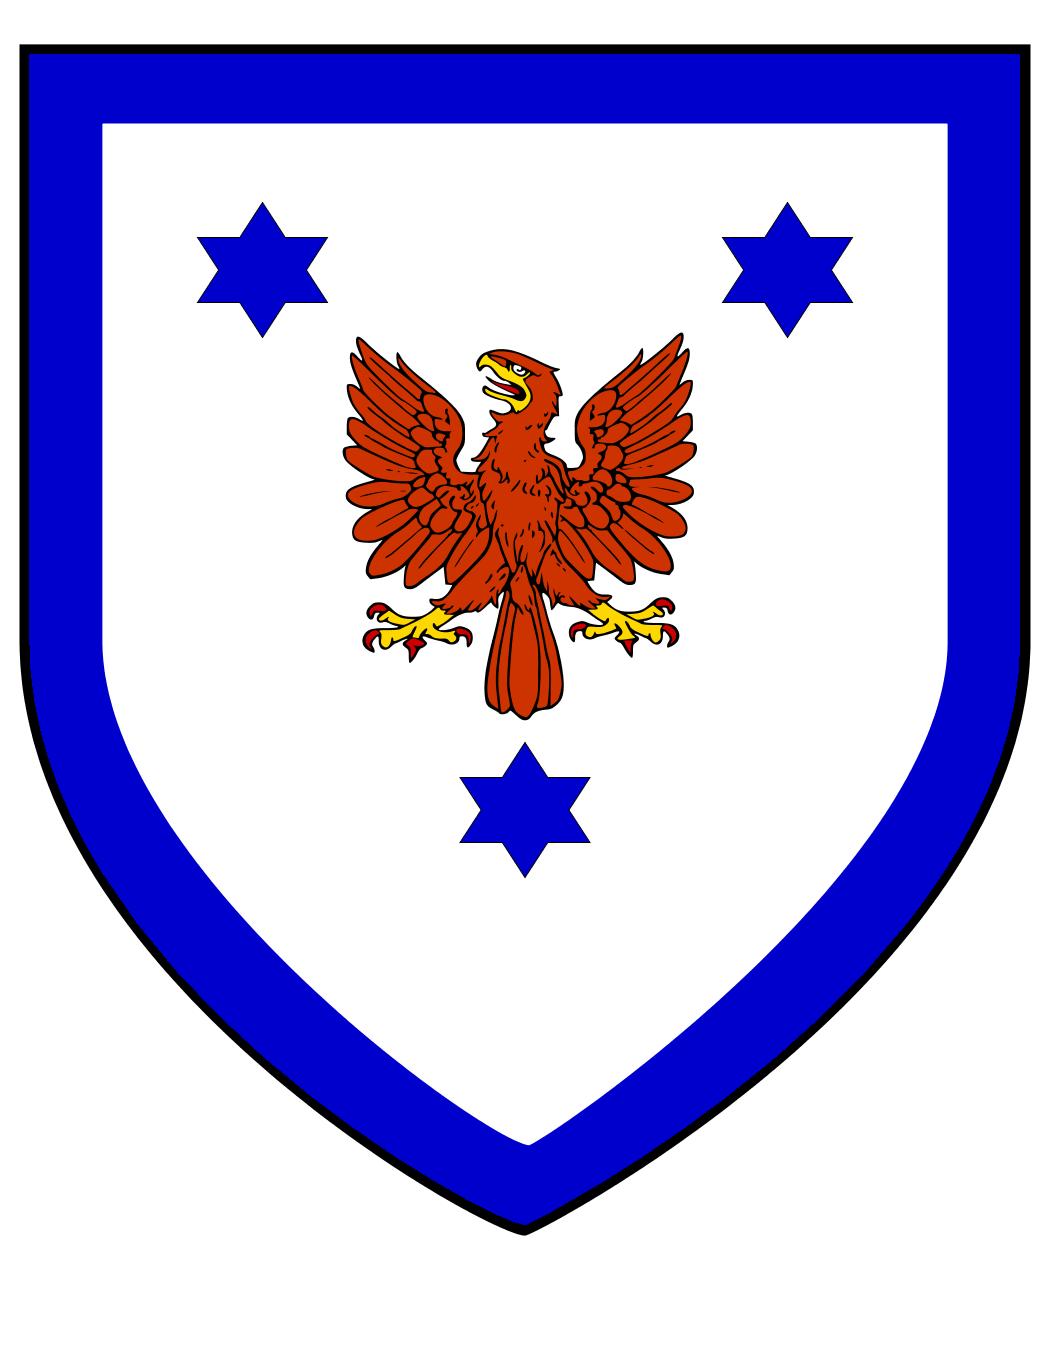 coat_of_arms_Adela_of_Eisleben.png